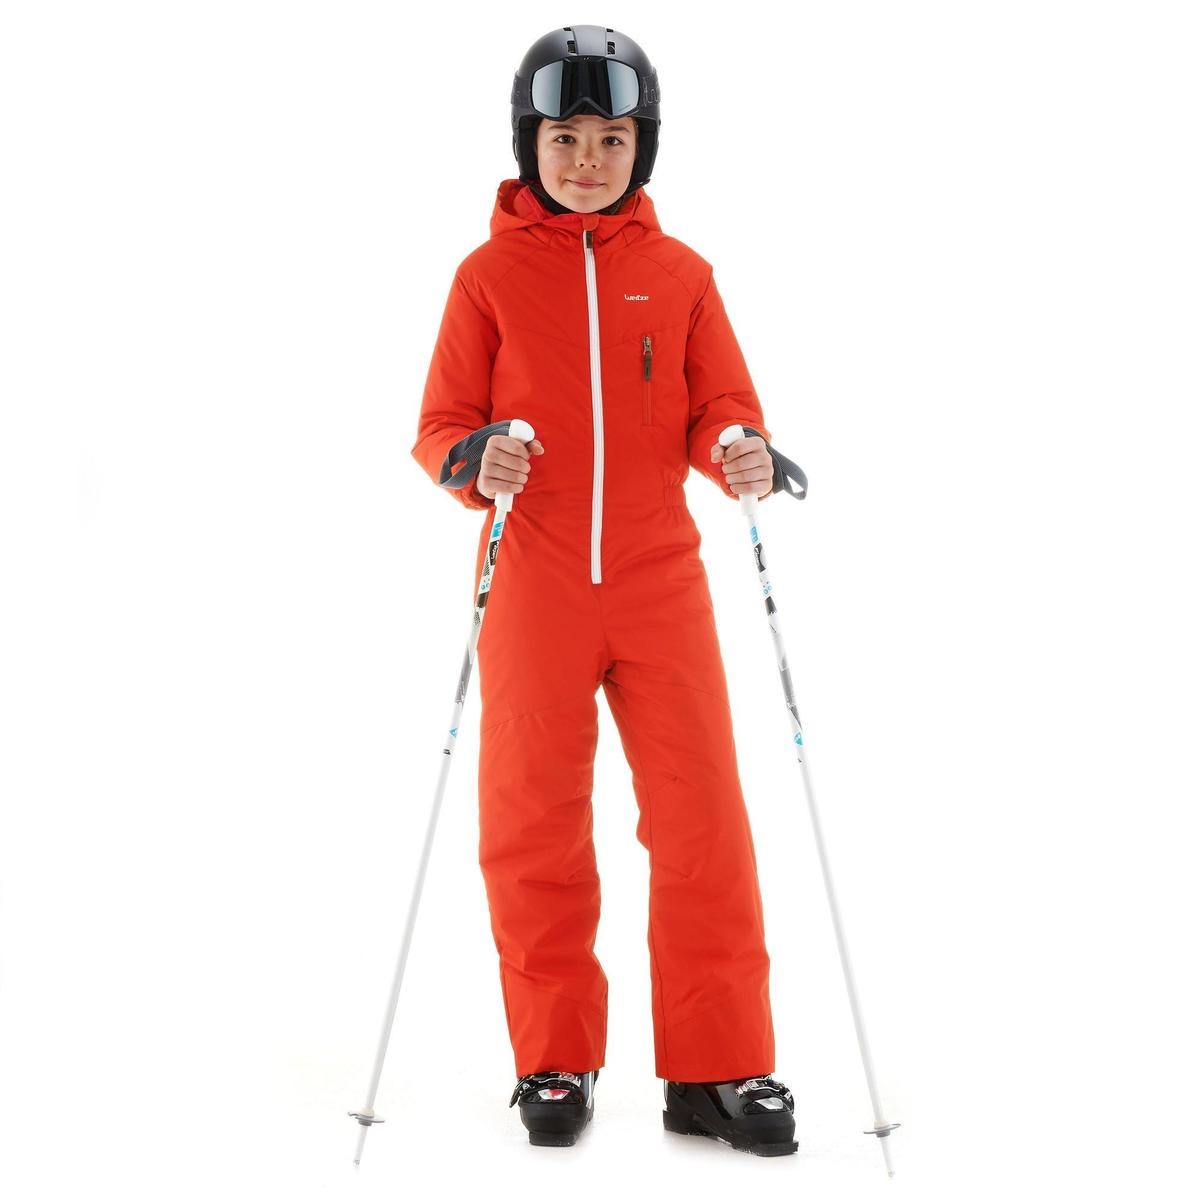 Bild 2 von Skianzug GL 100 Kinder rot/orange